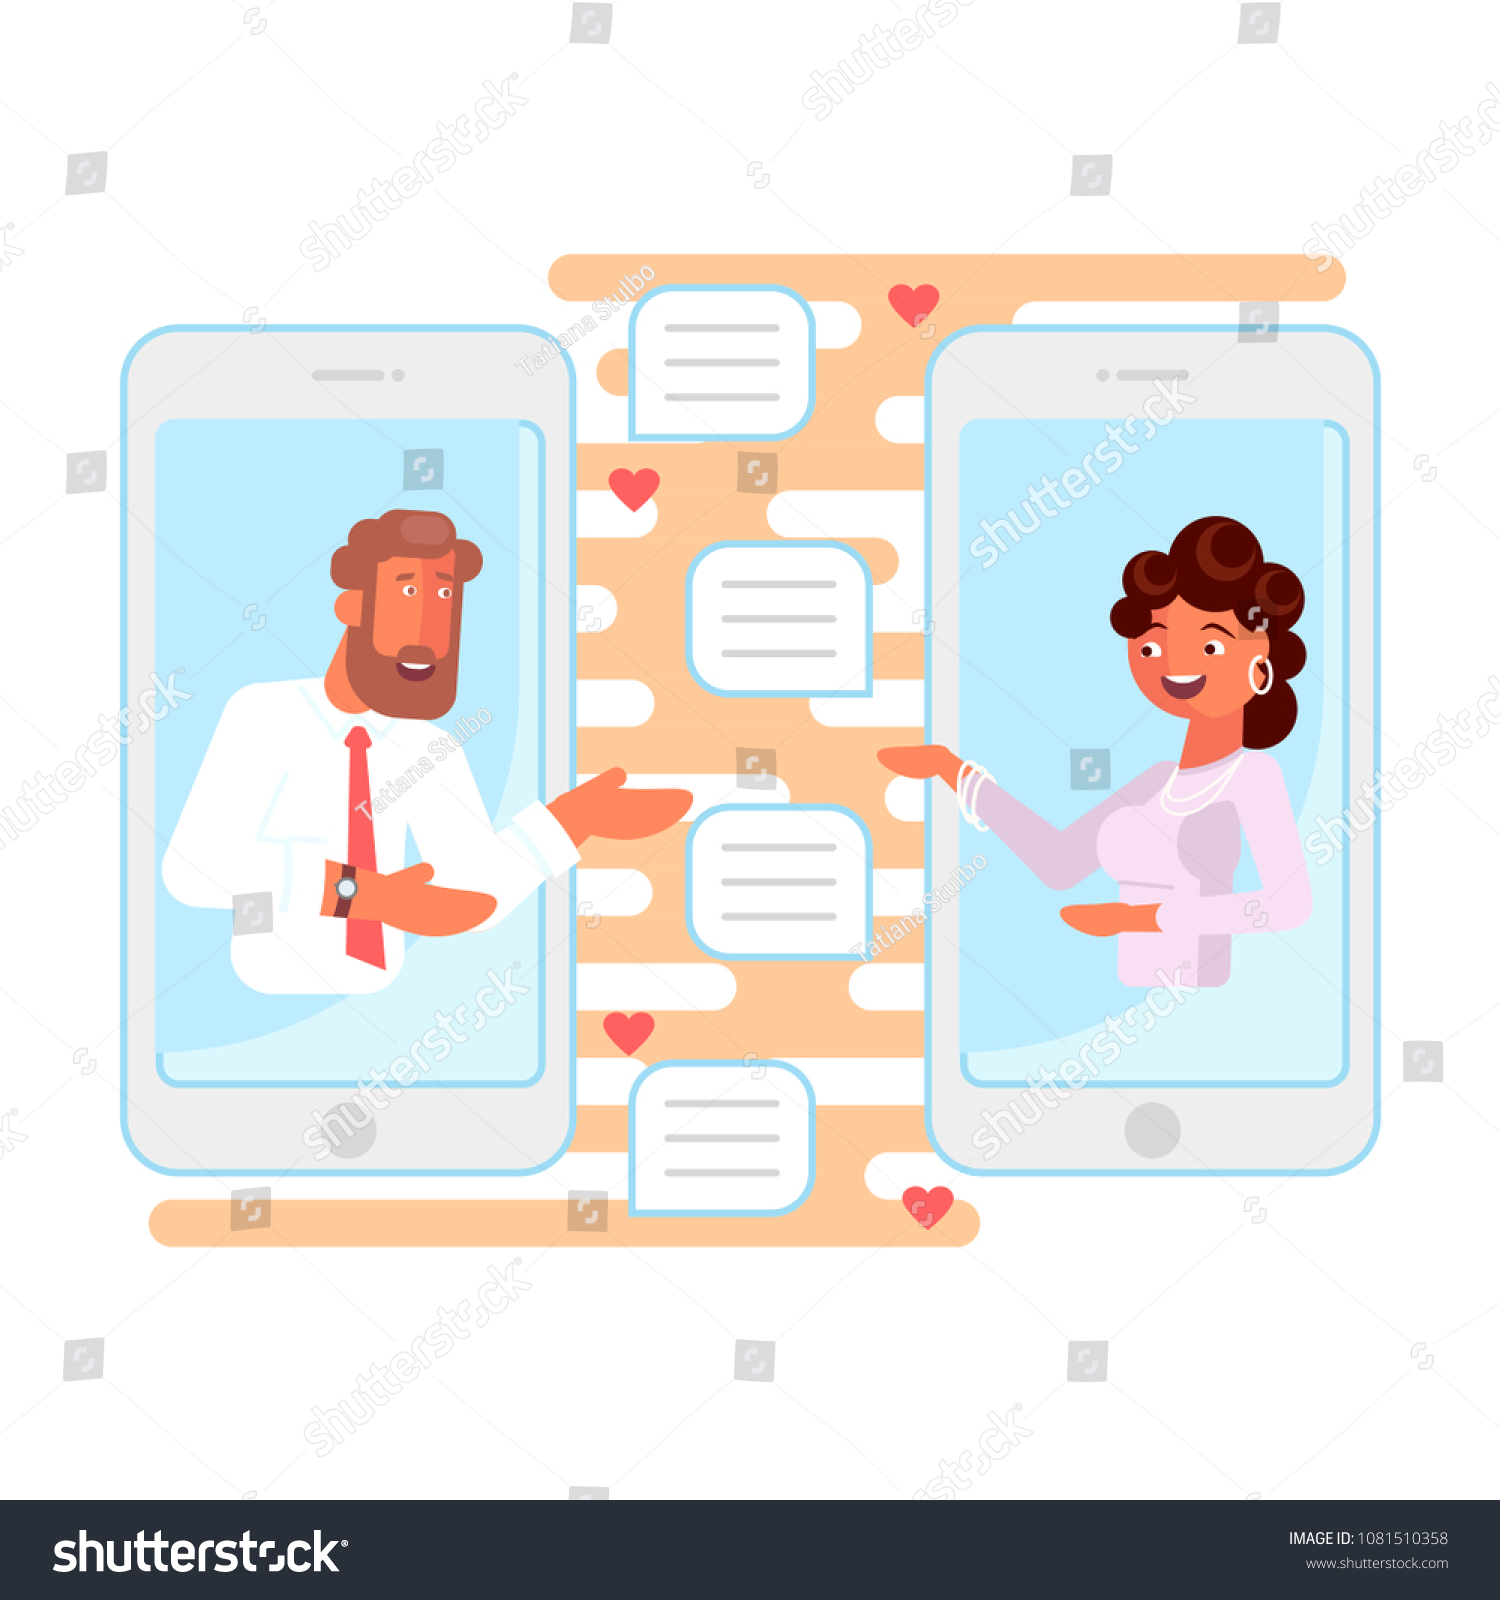 SDU online dating